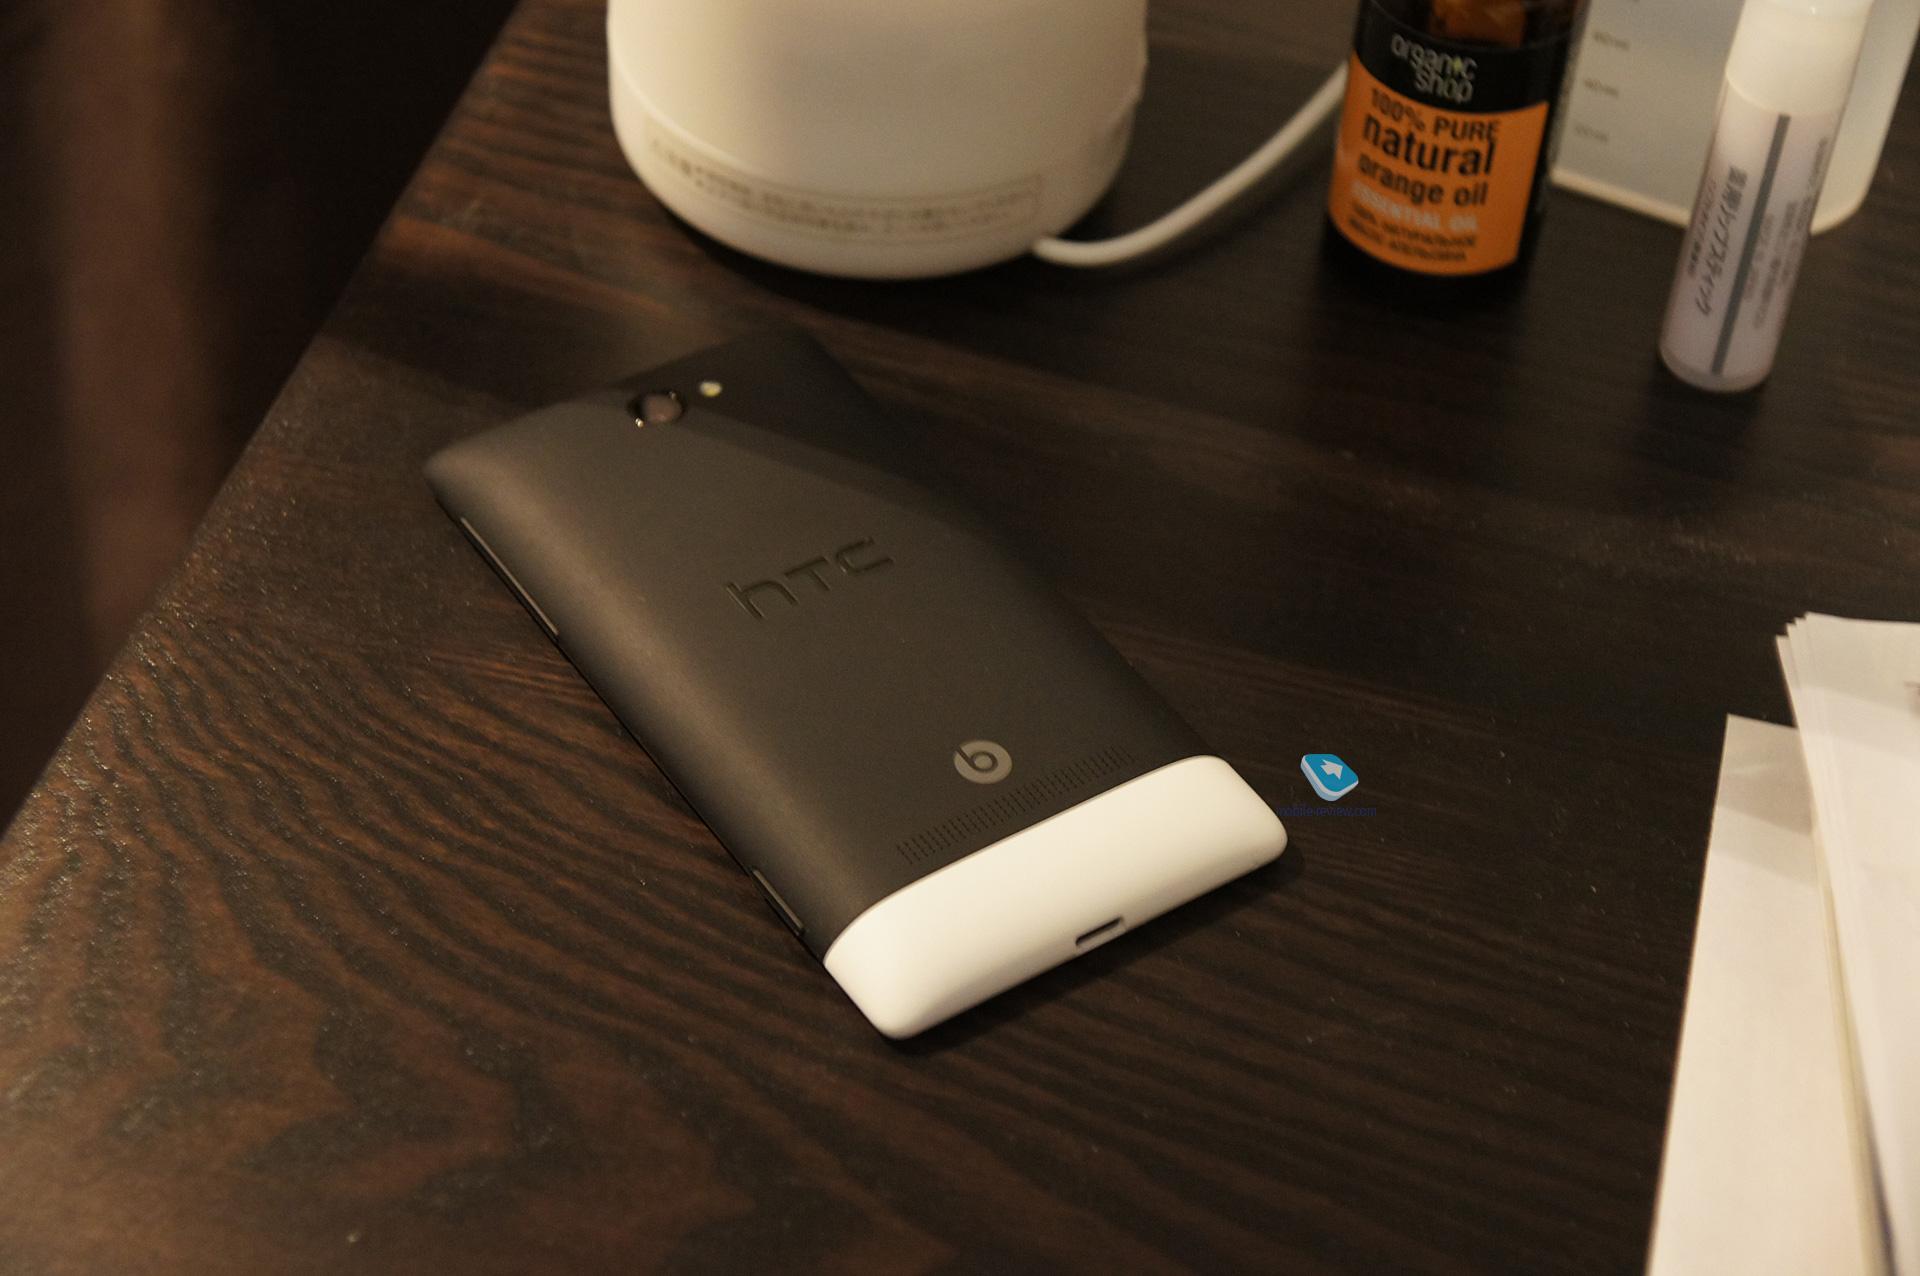 HTC Windows Phone 8S (Black White) скачать прошивку